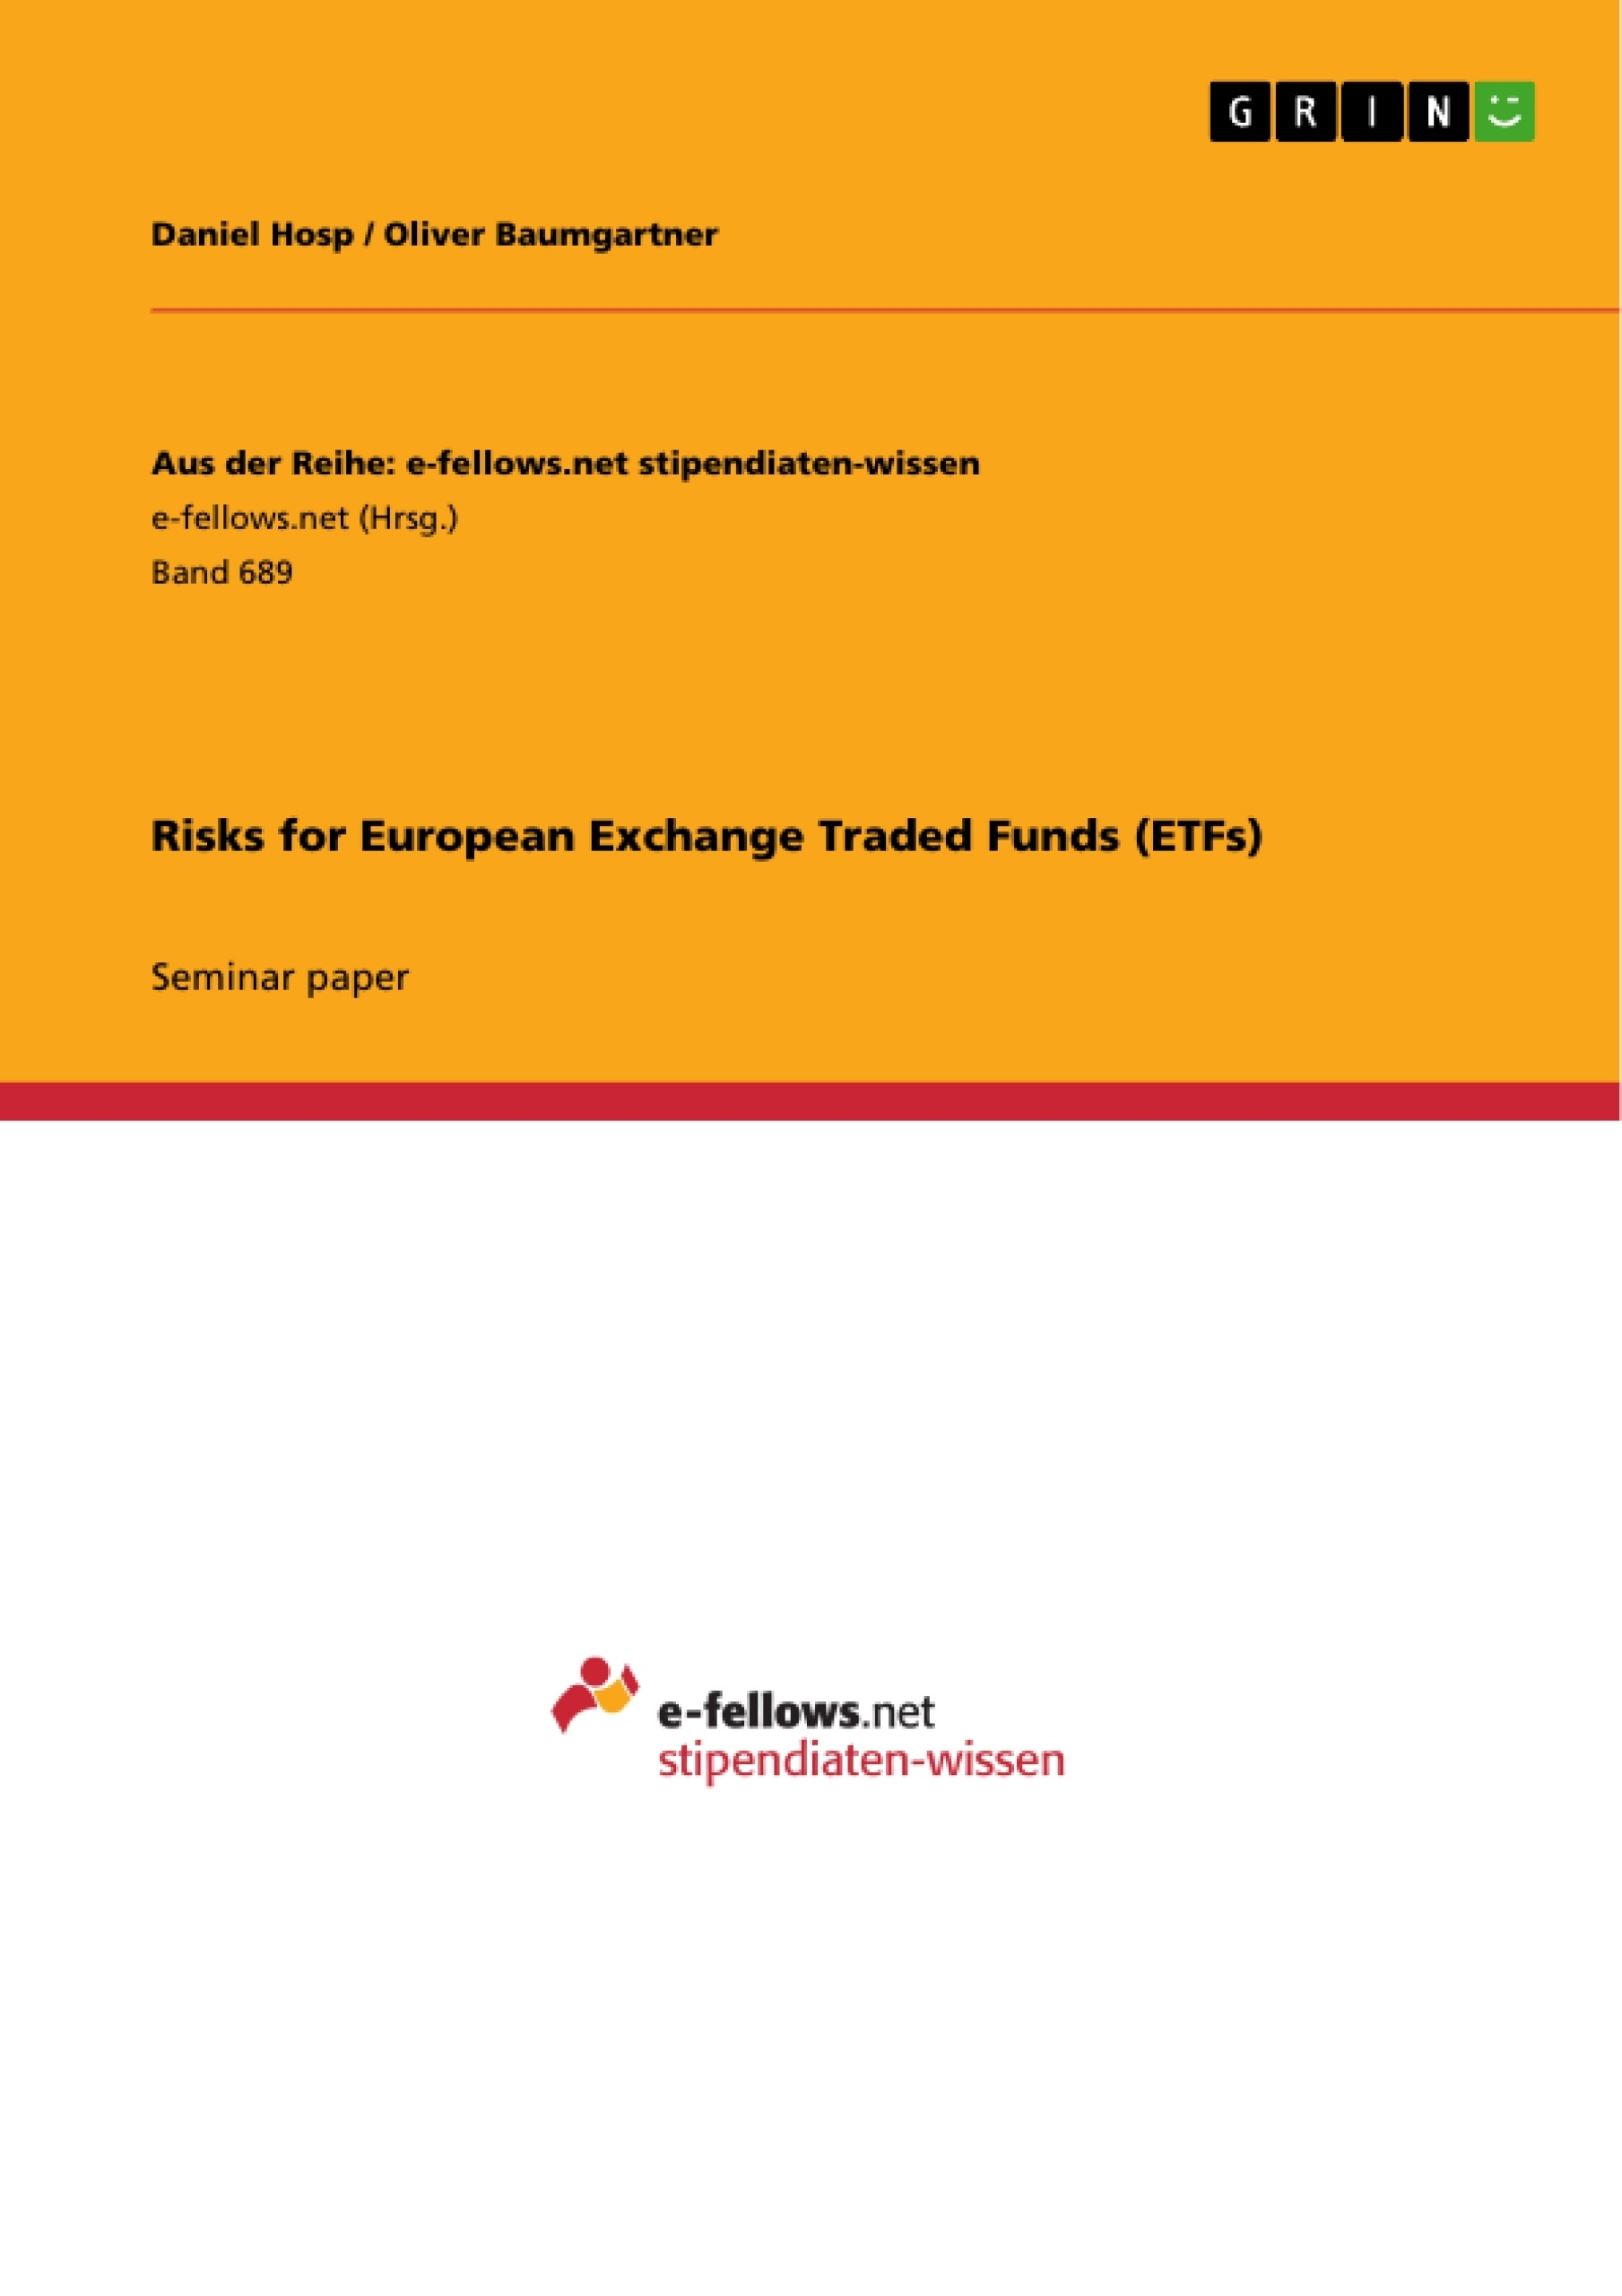 Title: Risks for European Exchange Traded Funds (ETFs)